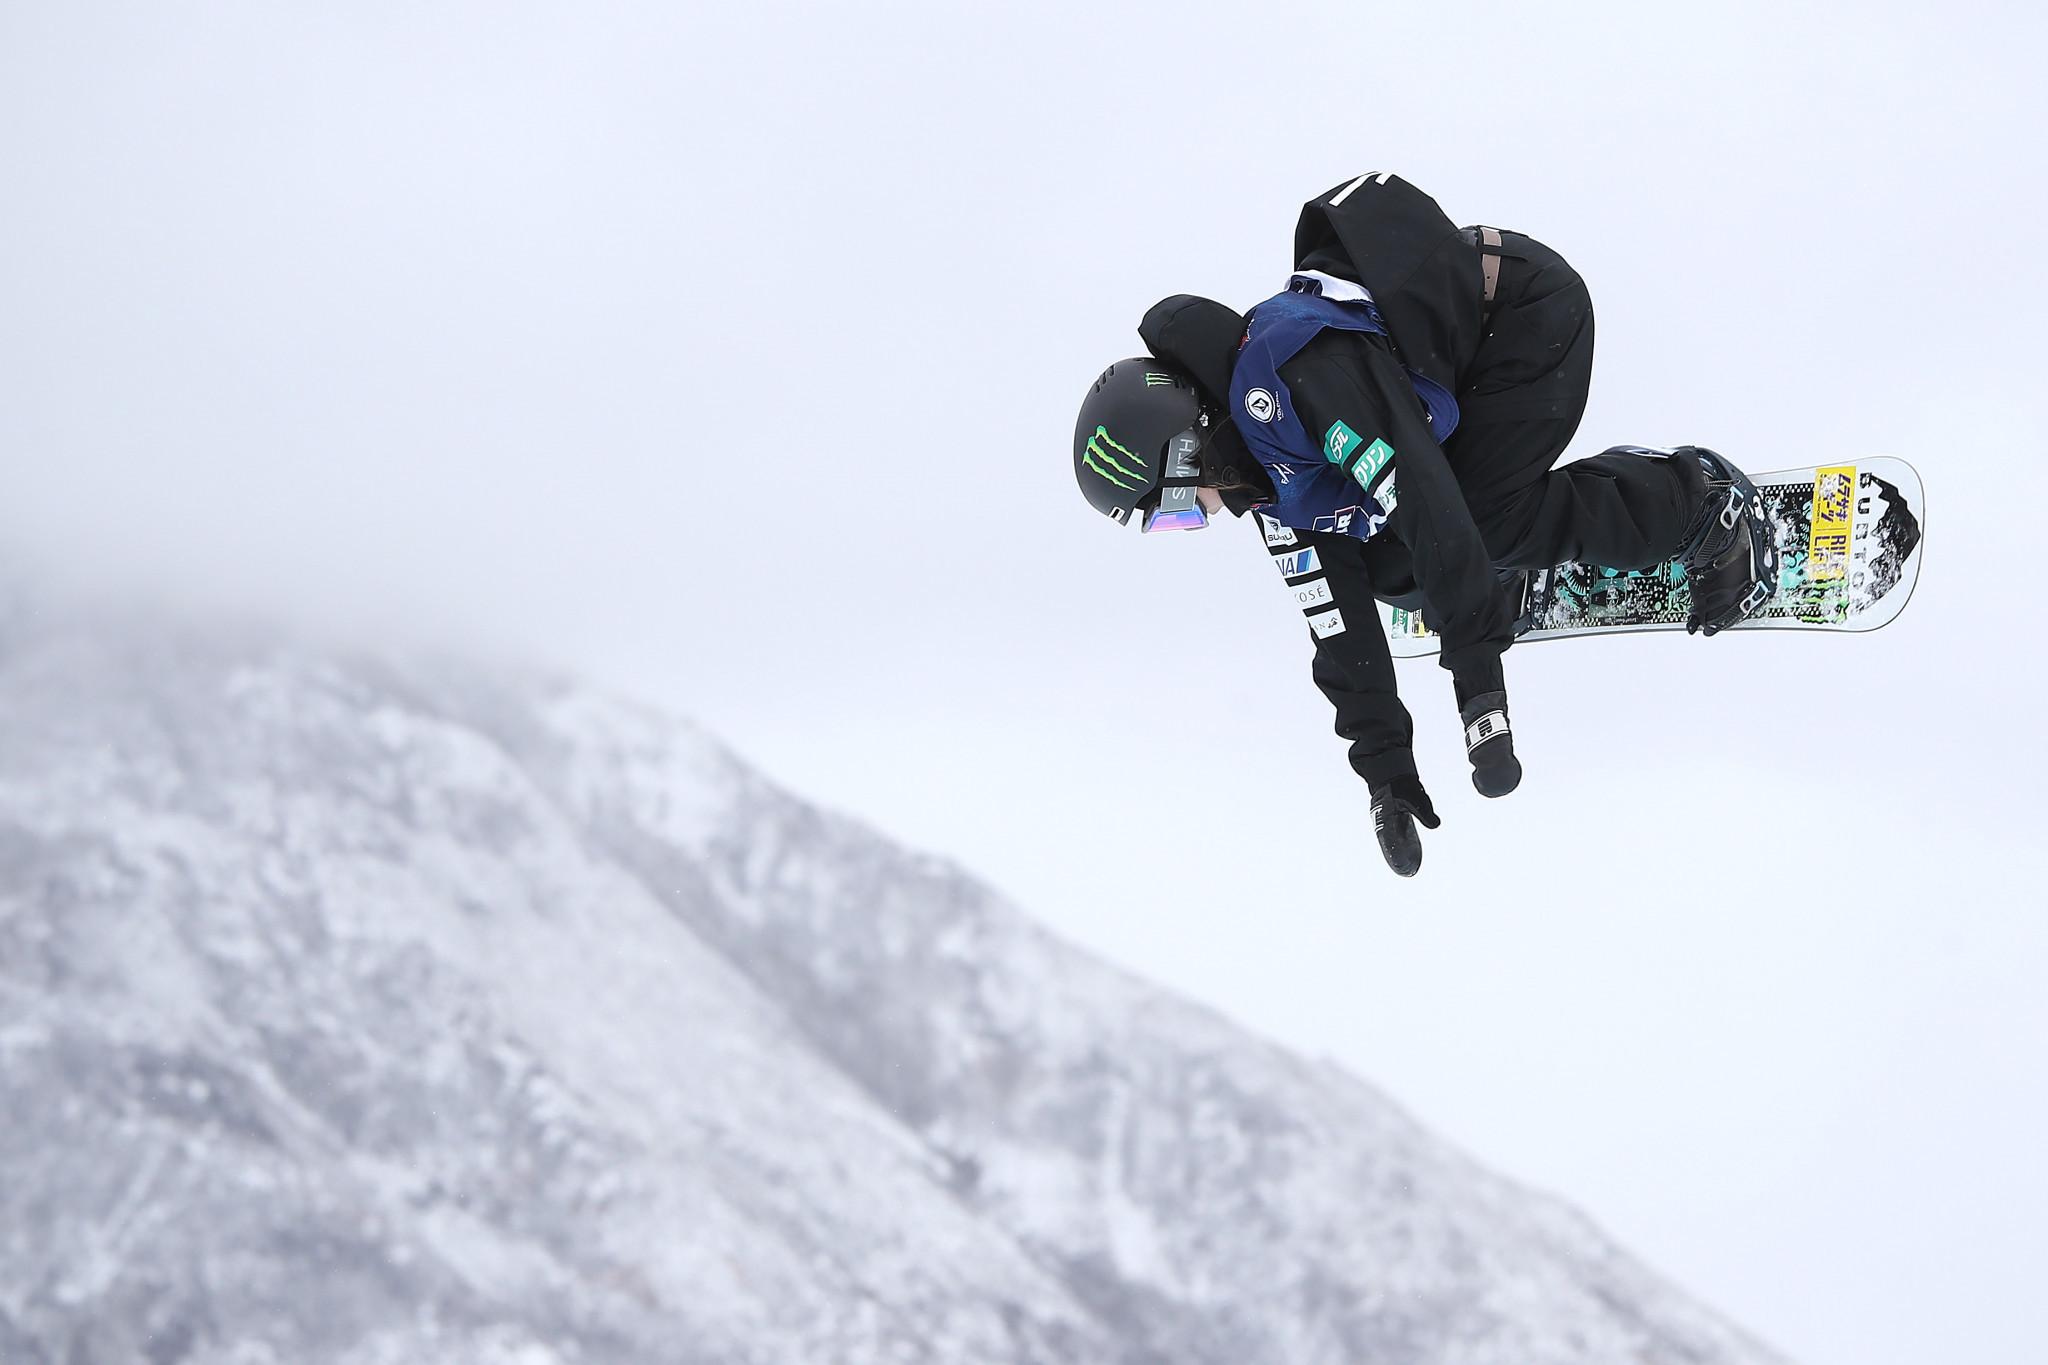 Prodigy Murase stuns at FIS Snowboard Big Air World Cup